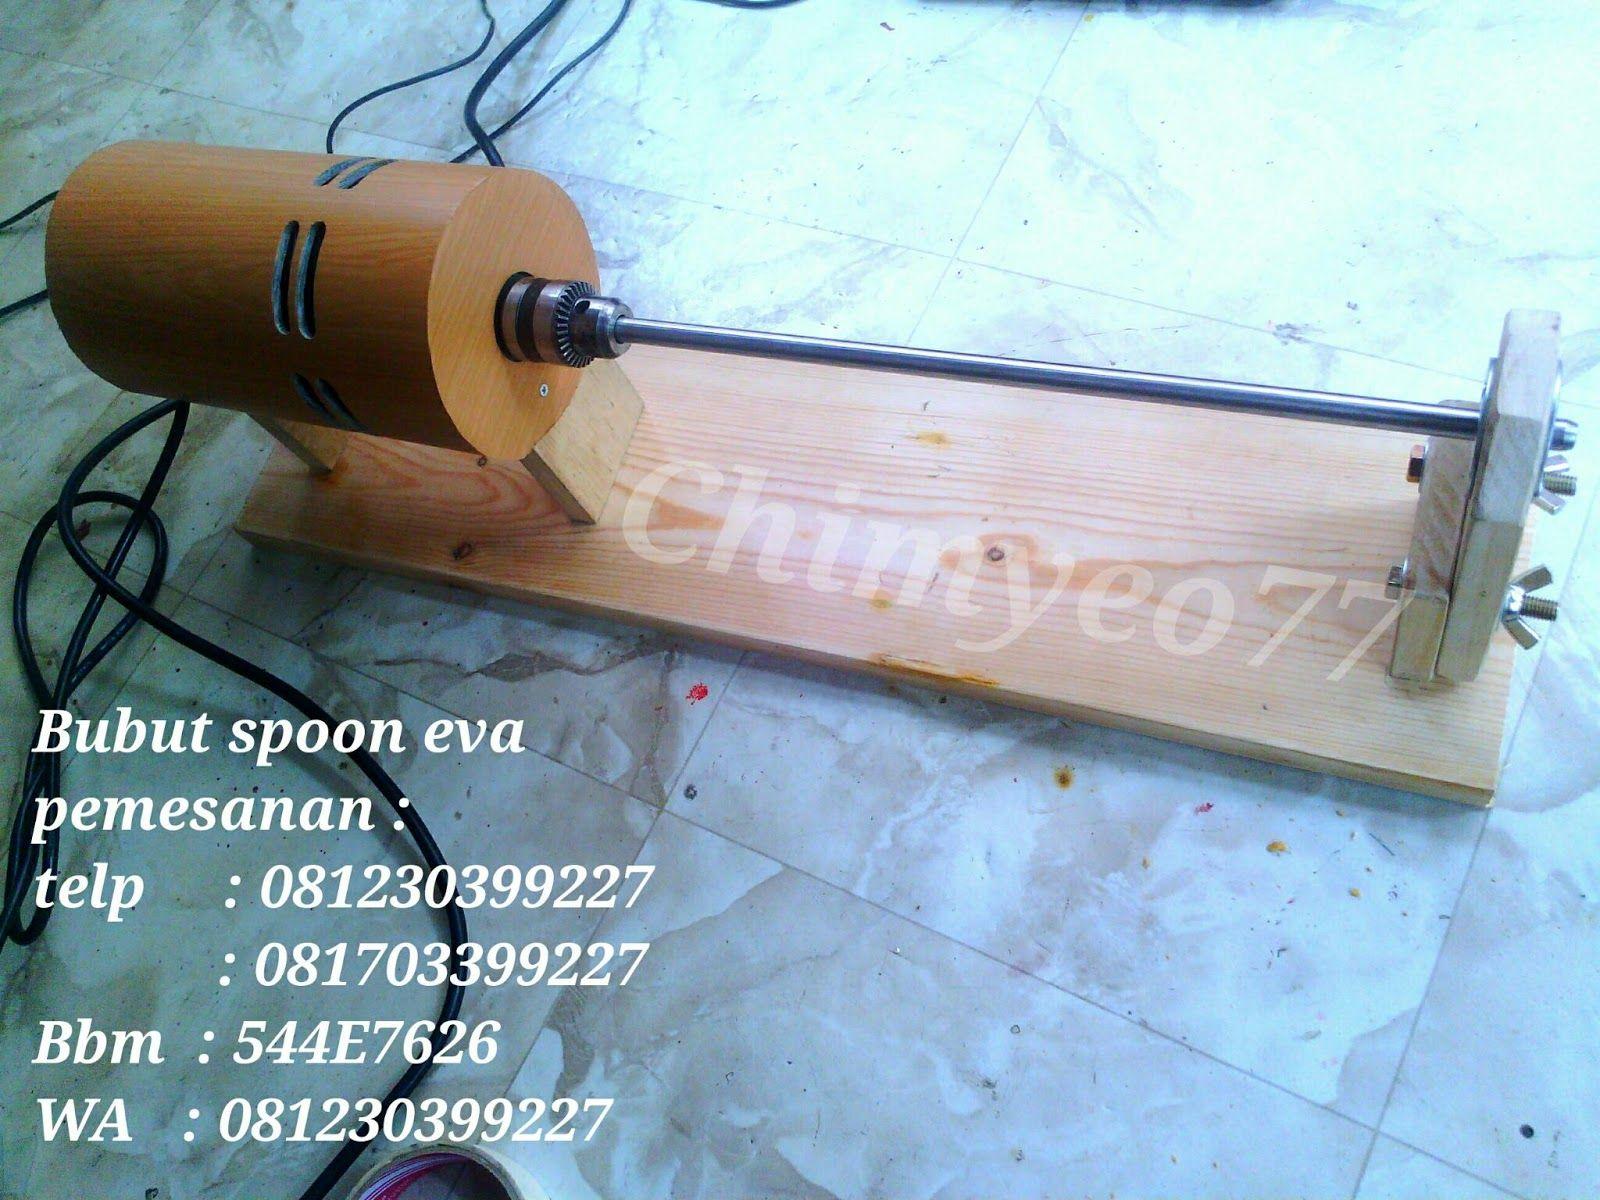 Custom Rod Indonesia Bubut spoon eva Wood Lathe Bait Spoon Indonesia